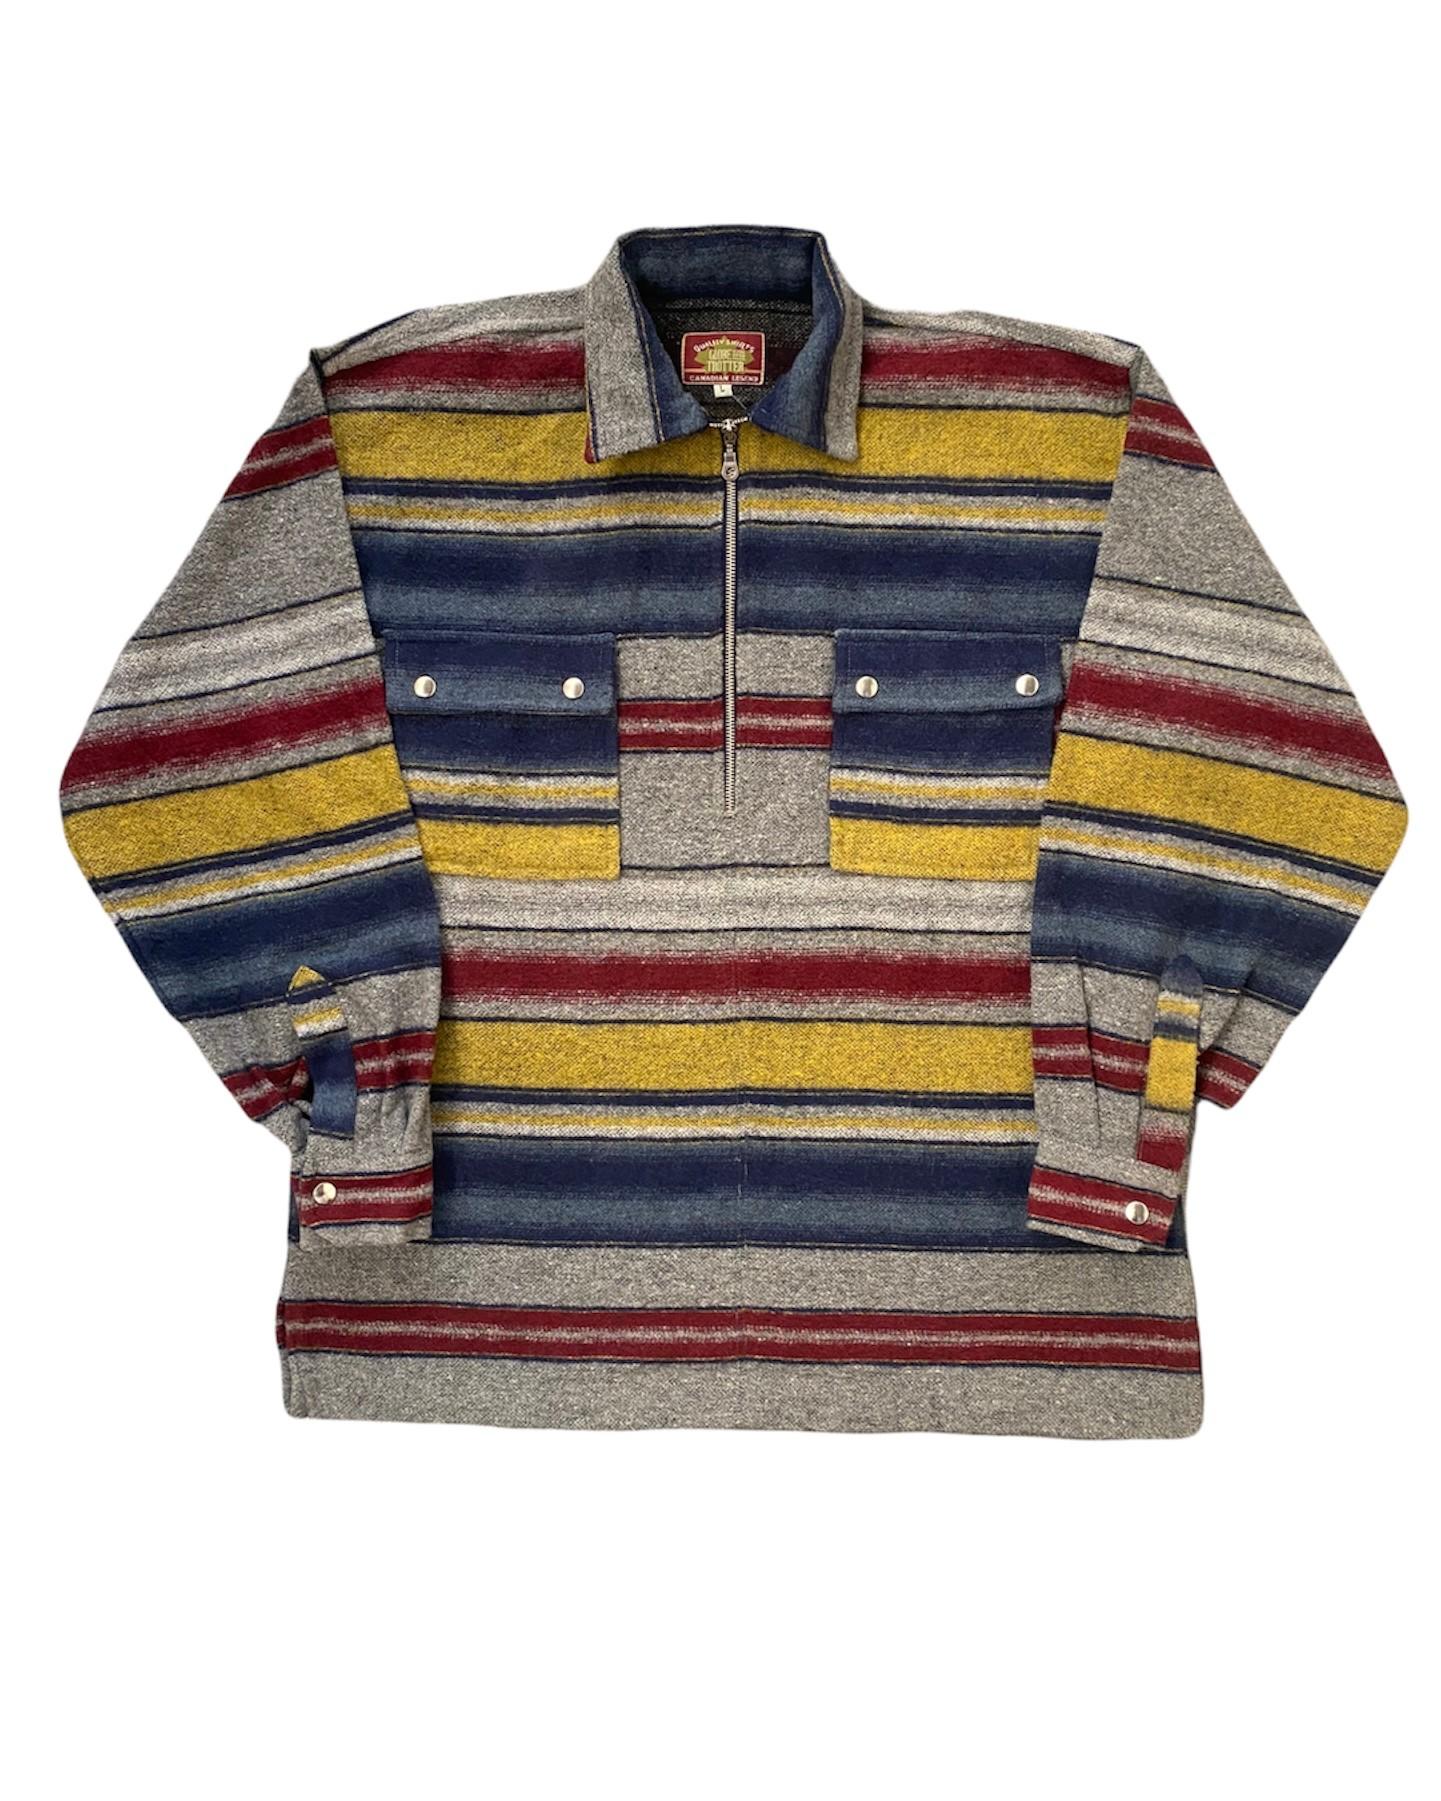 Globe Trotter Vintage Kazak (L)